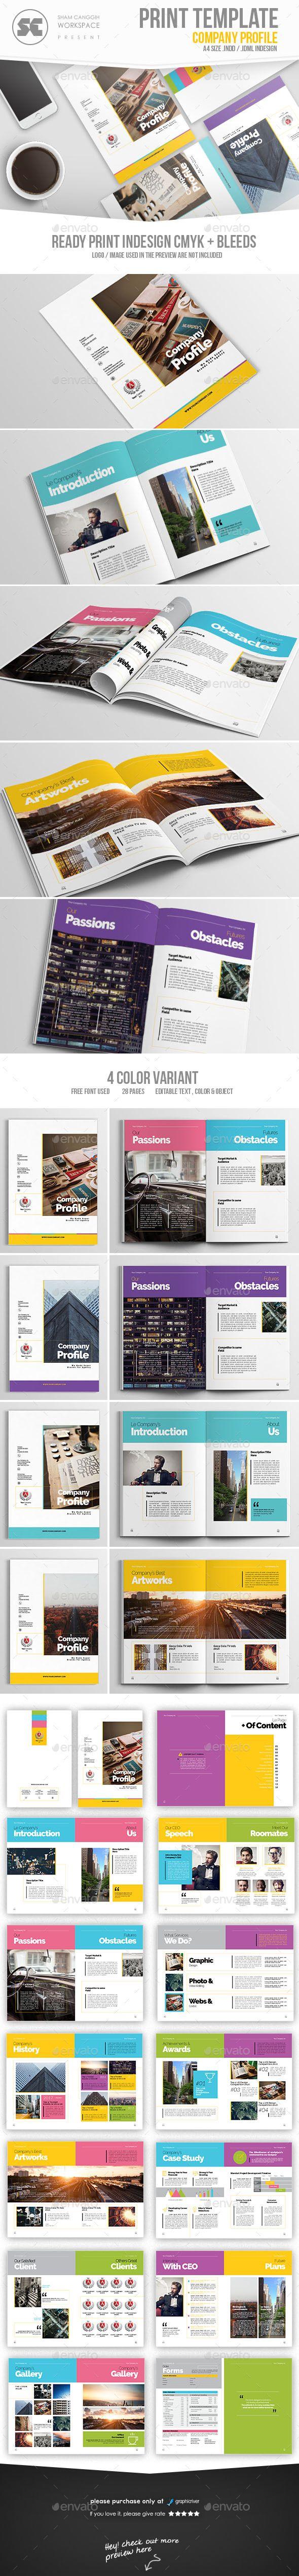 105 best pany Profile Tempale images on Pinterest